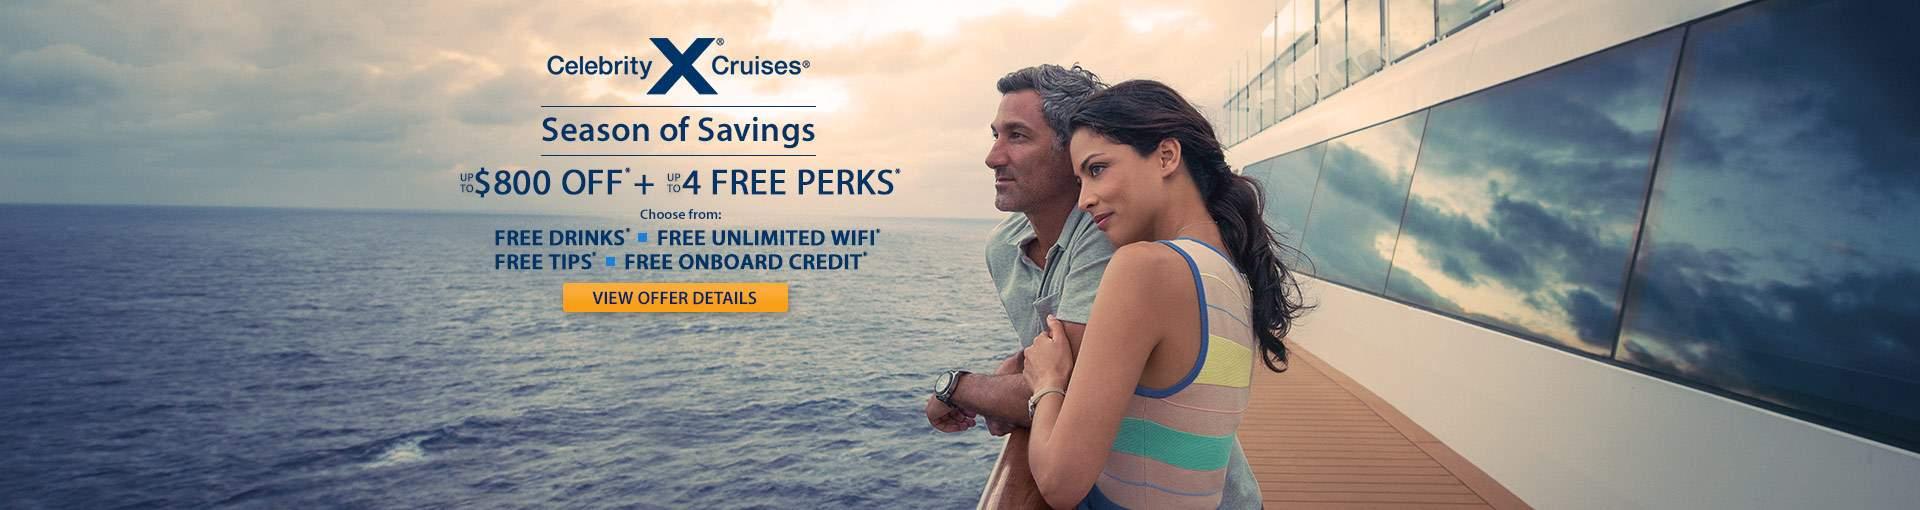 Celebrity Cruises with Savings plus Free Perks